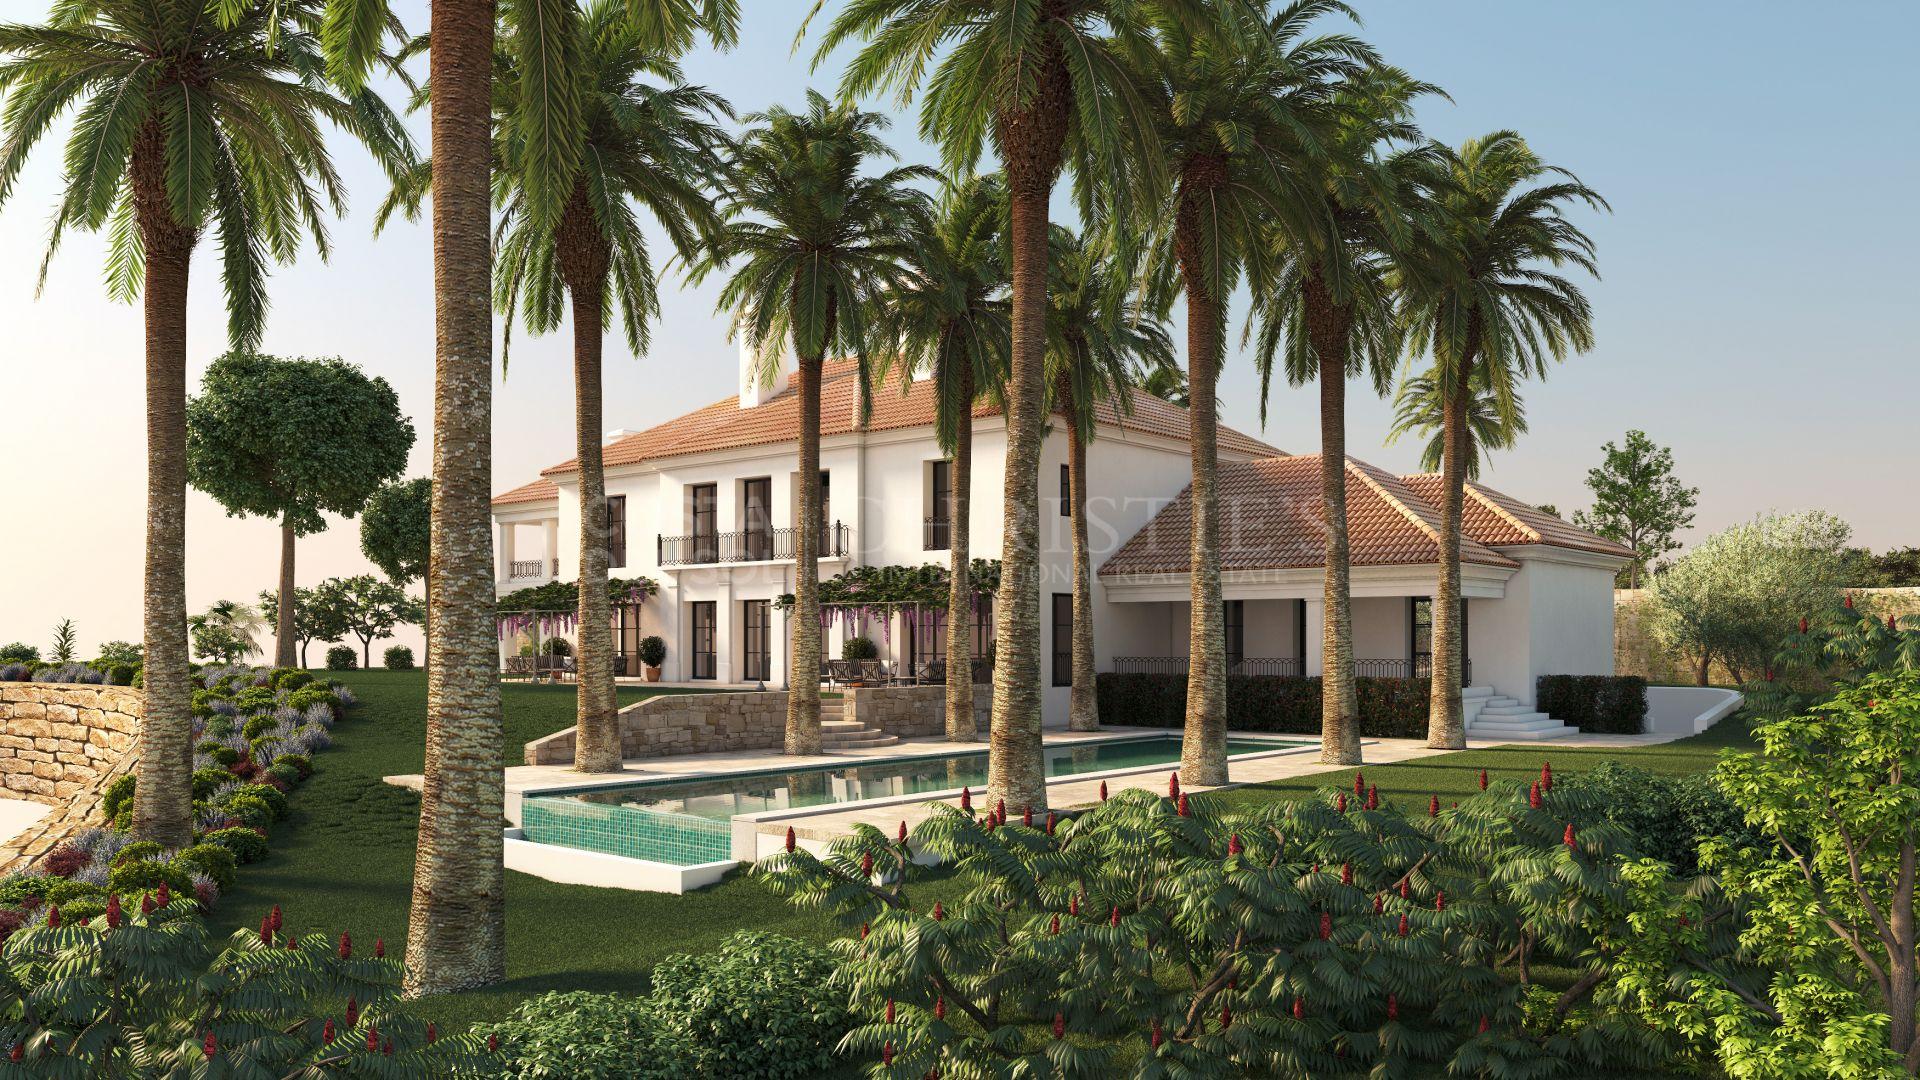 Dreamed villa in Finca Cortesin | Christie's International Real Estate